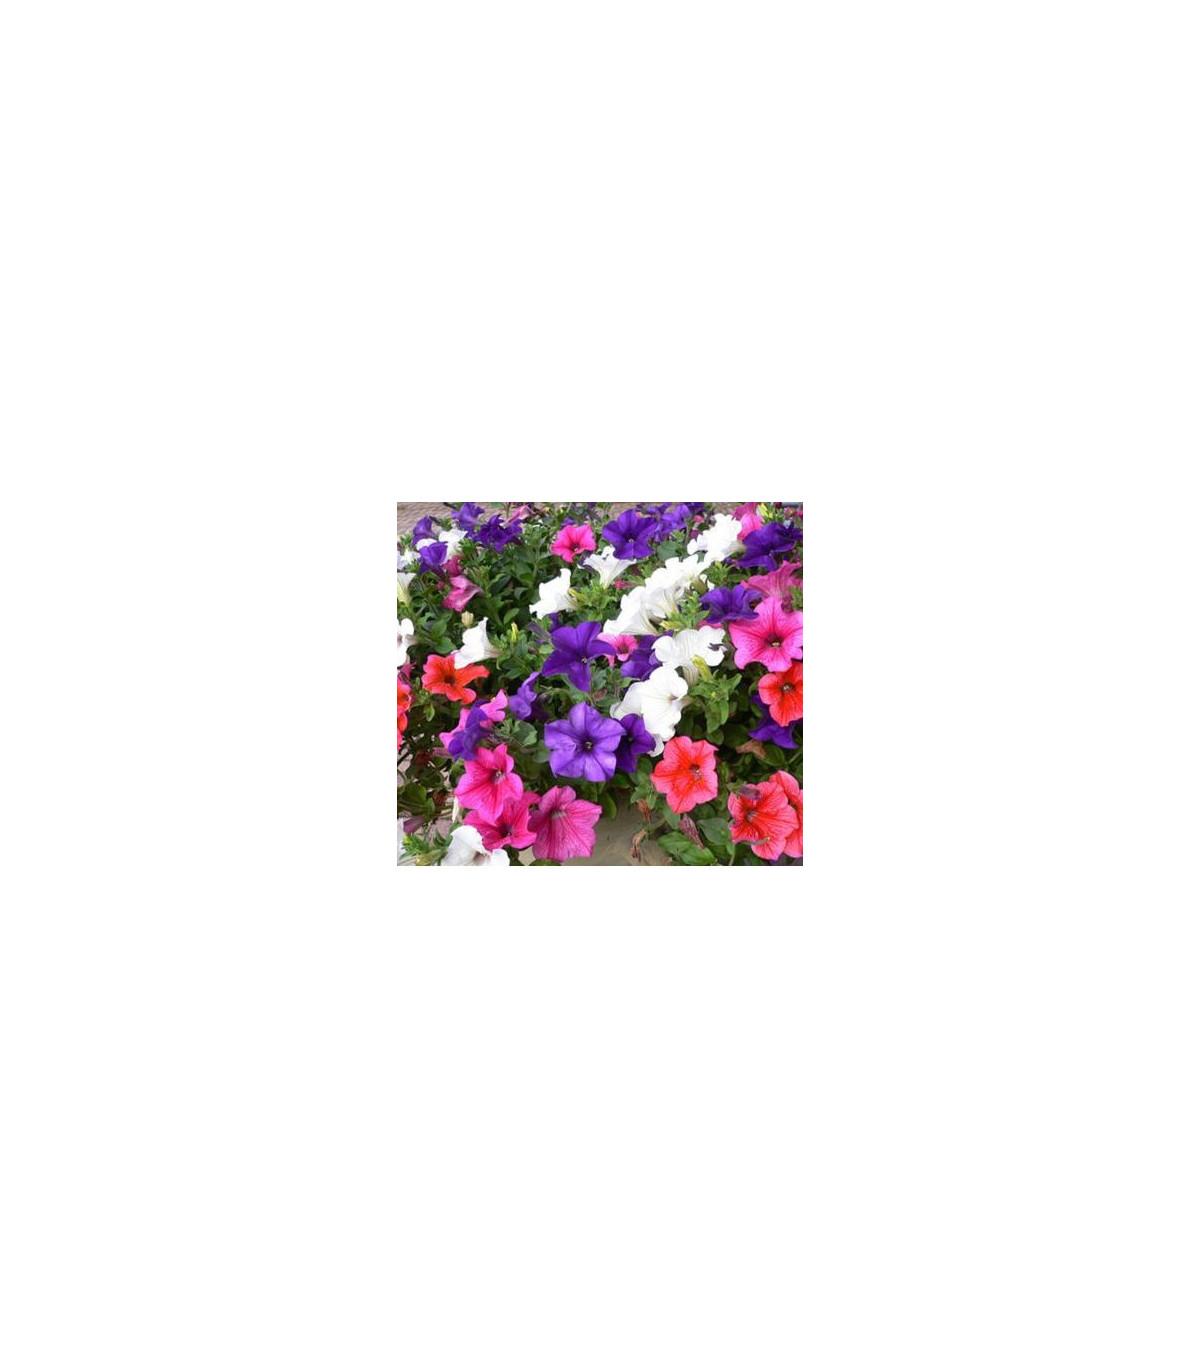 Petúnie velkokvětá převislá mix barev - Surfínie - Petunia hybrida pendula - semena - 0,05 g